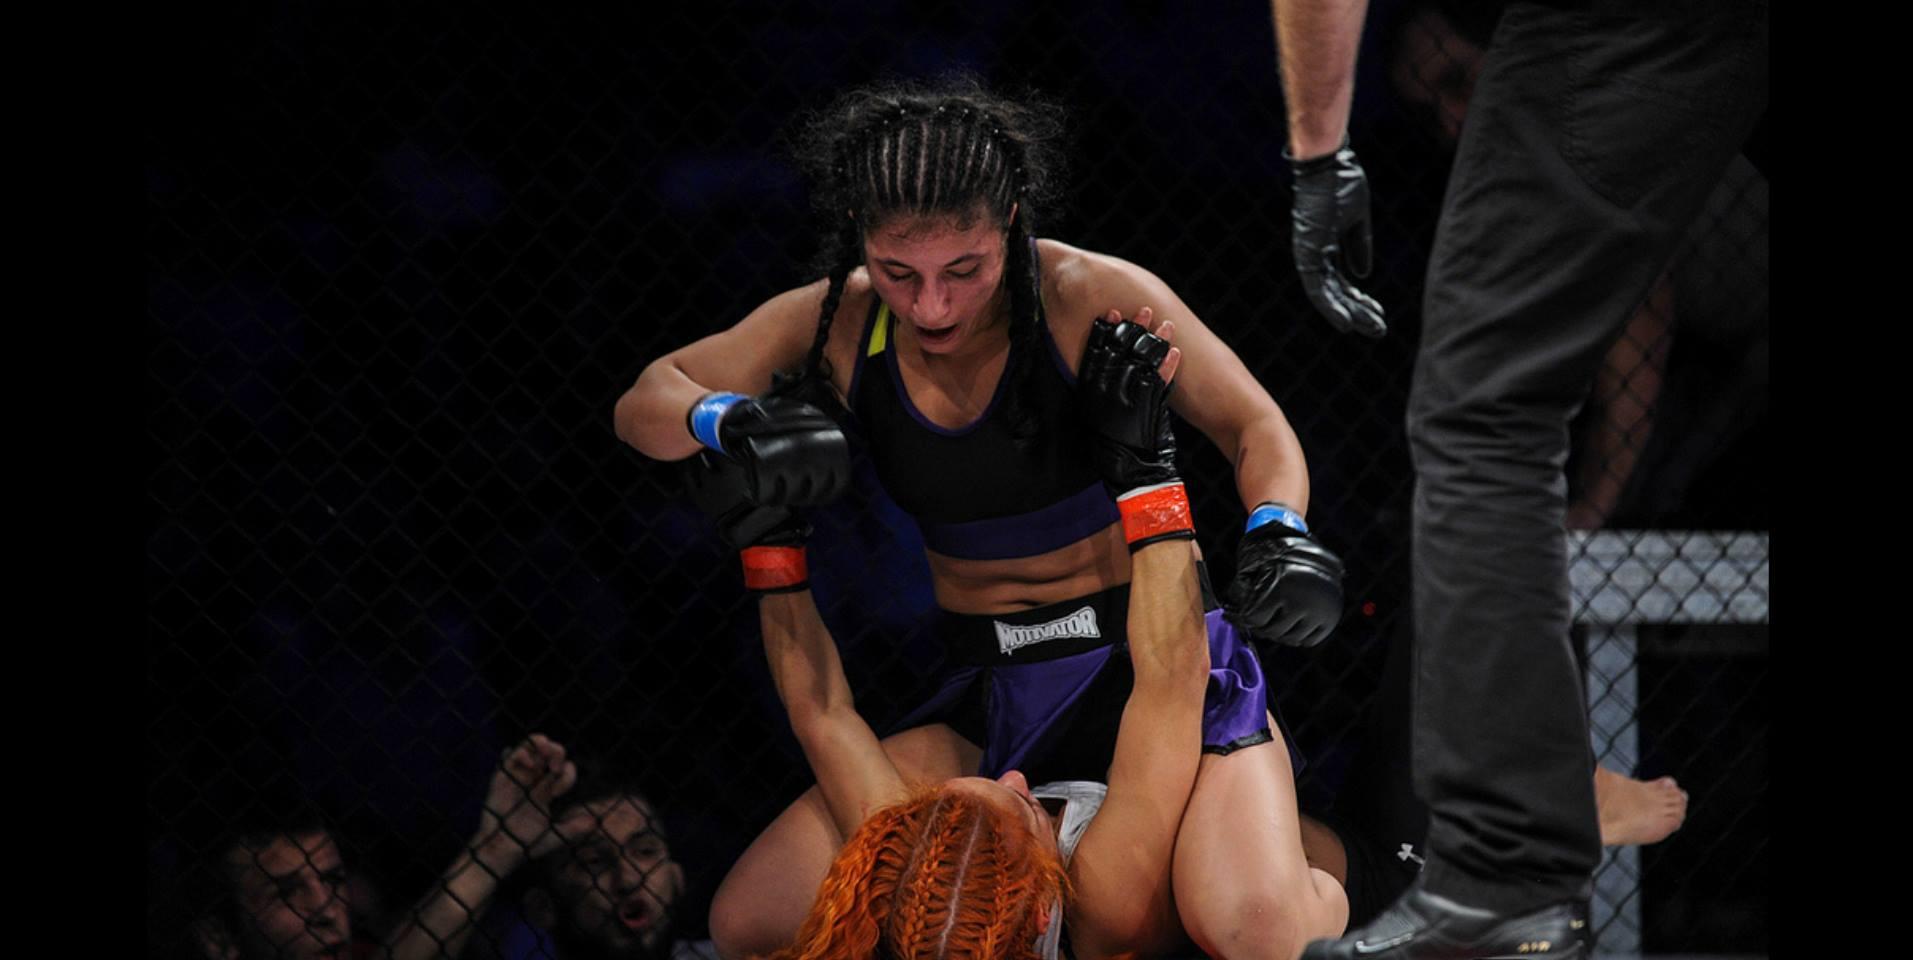 Iman Darabi in her professional debut. Photo by Piotr Pedziszweski for MMA Rocks.